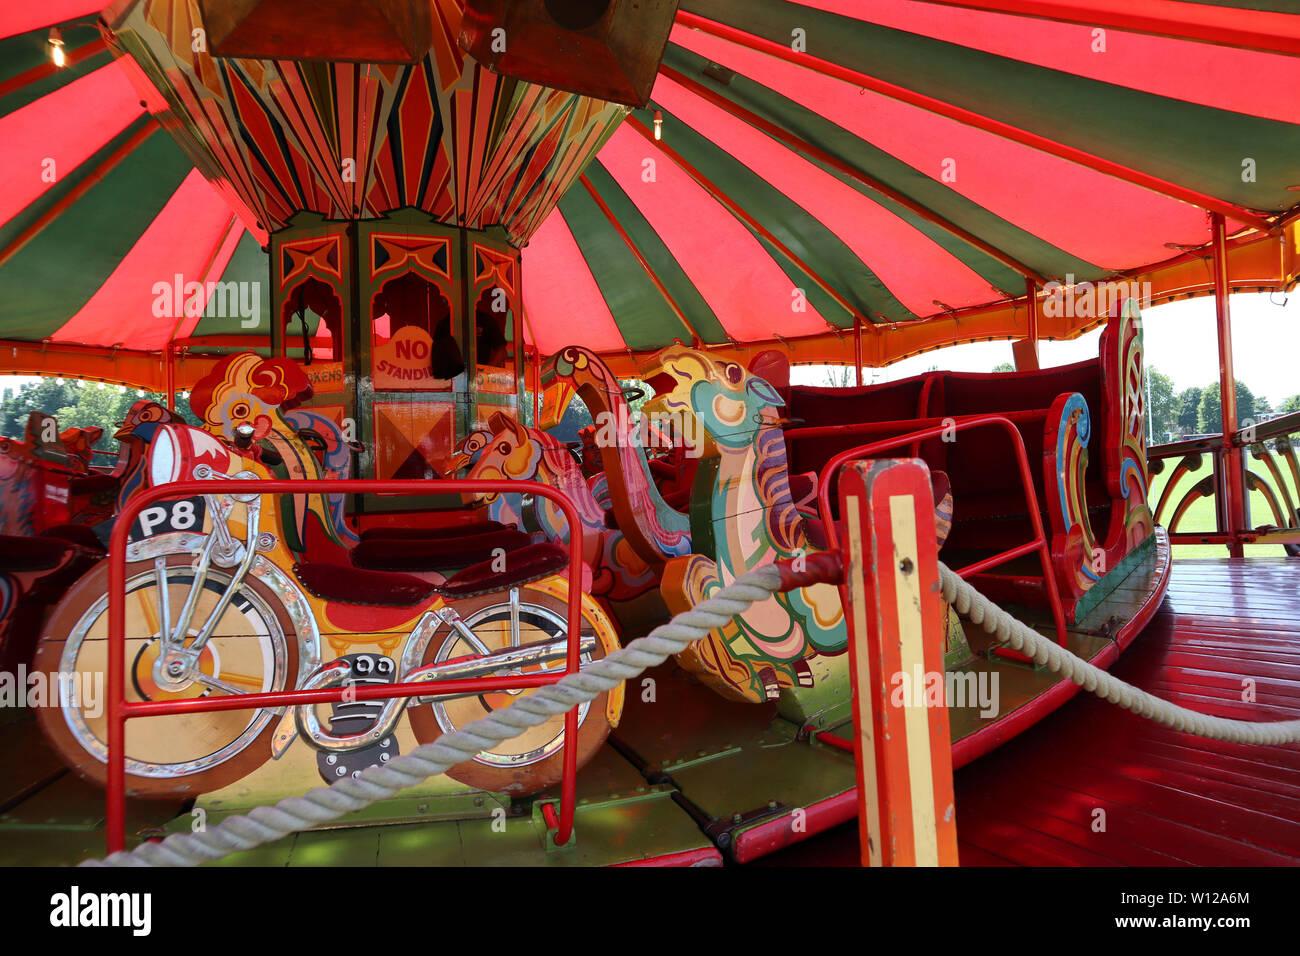 Jungle Thriller Ark, Carters Steam Fair, Peckham Rye Common